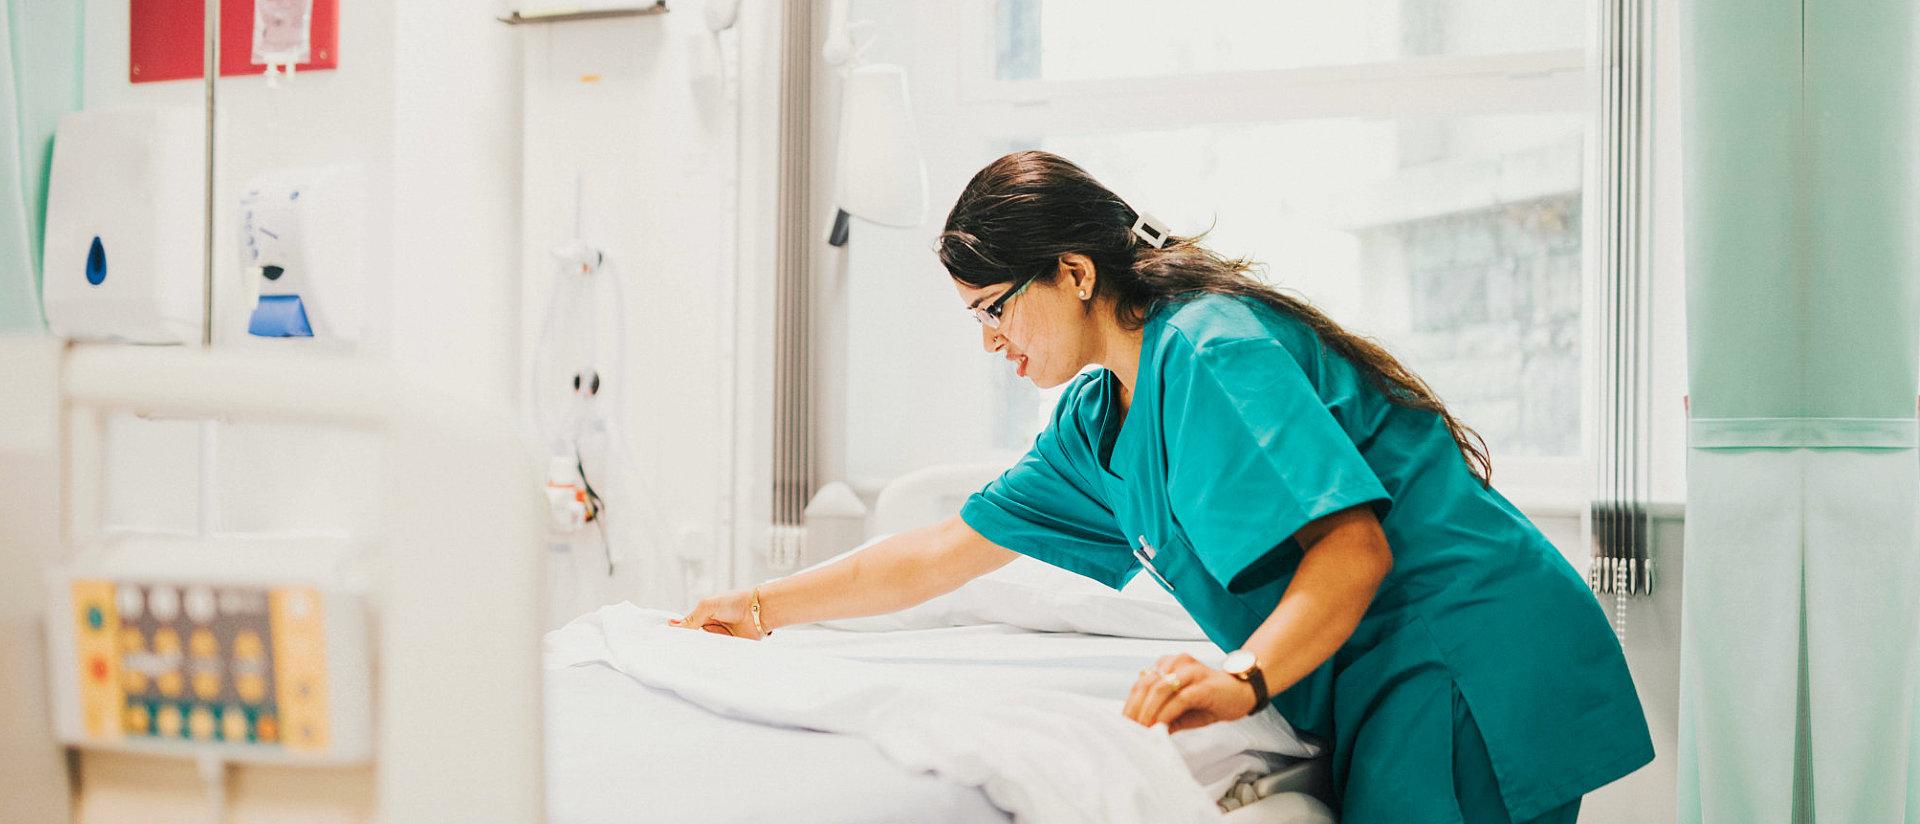 nurse folding bed sheet